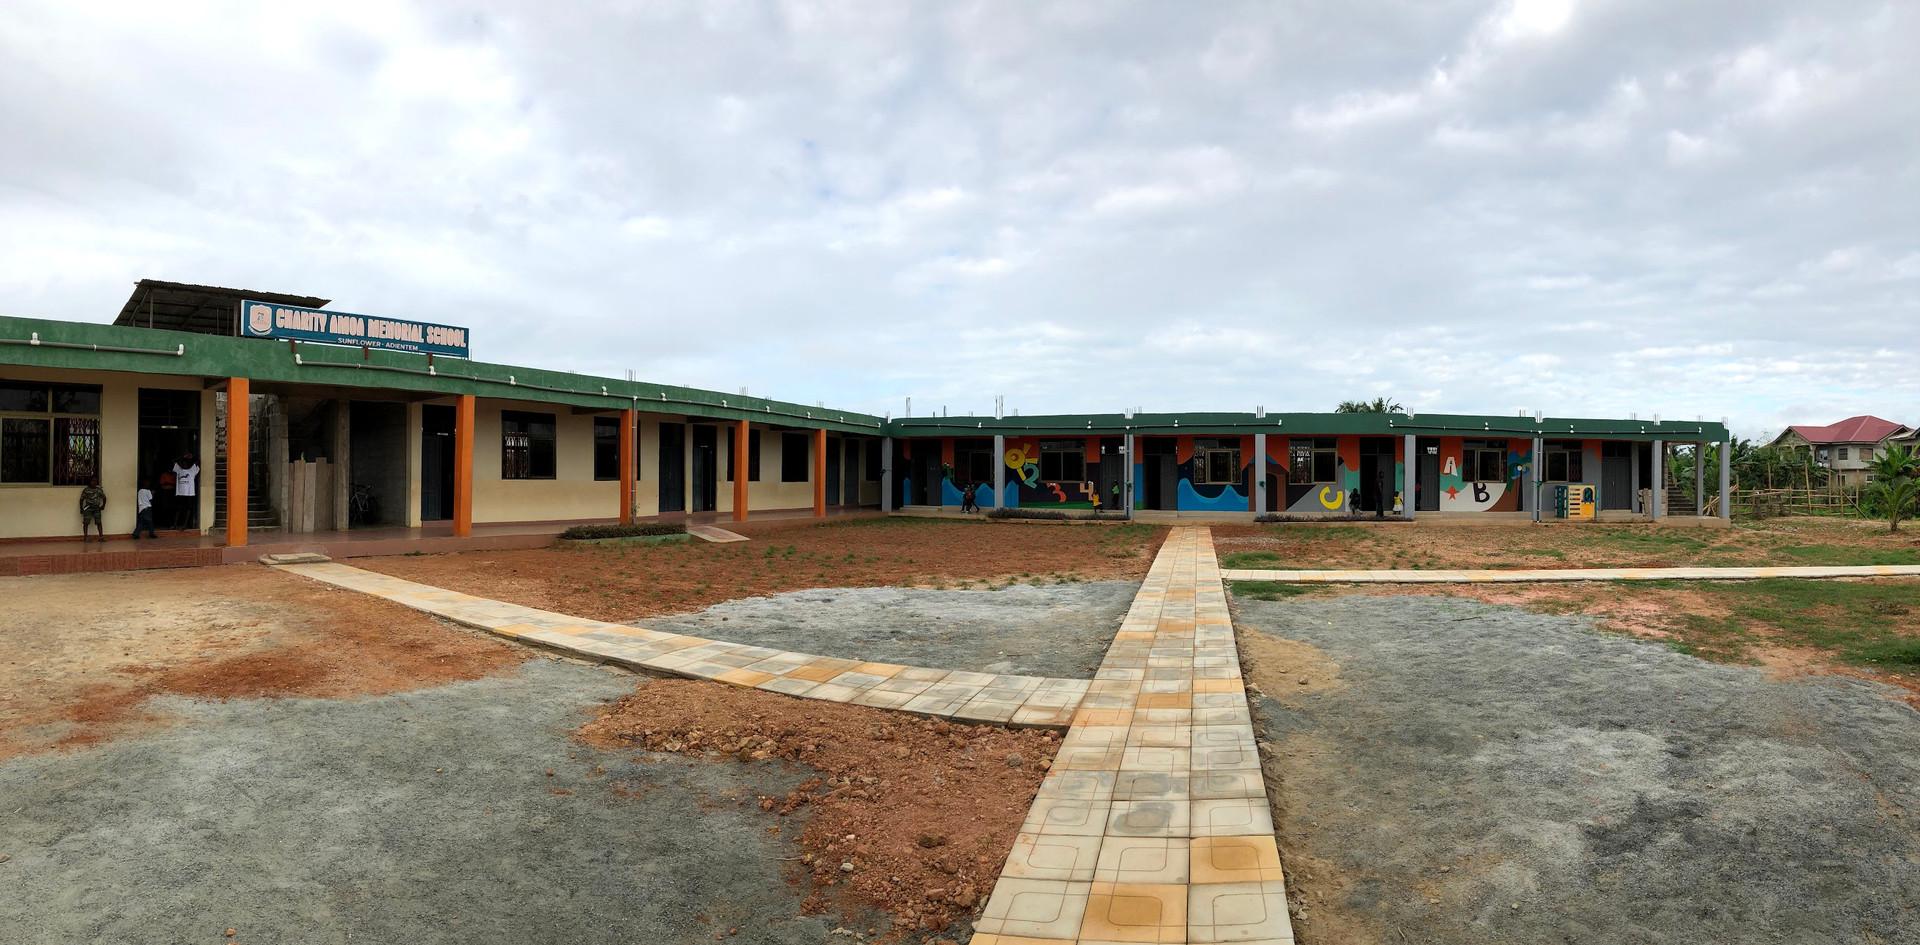 Main entrance of CAMS